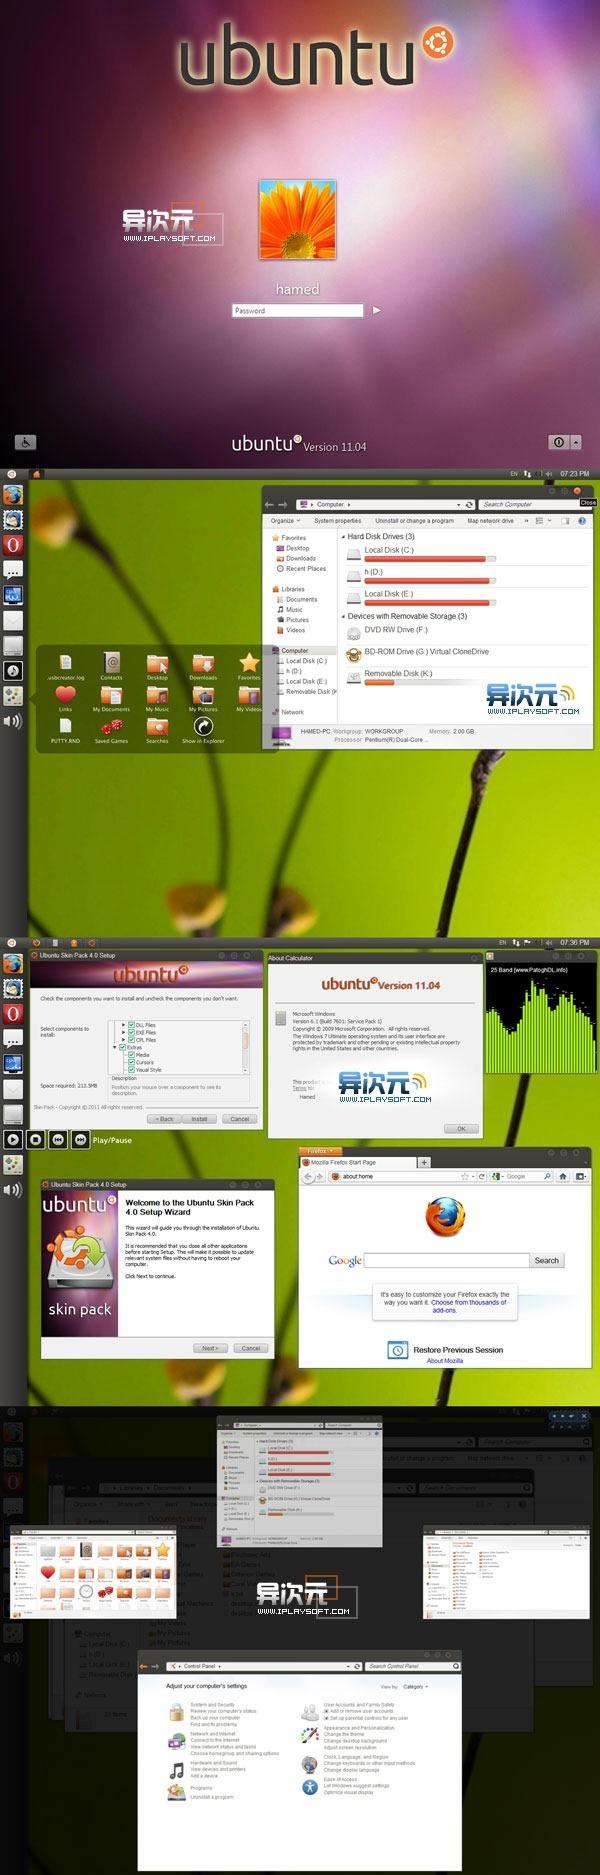 Ubuntu Skin Pack 主题包